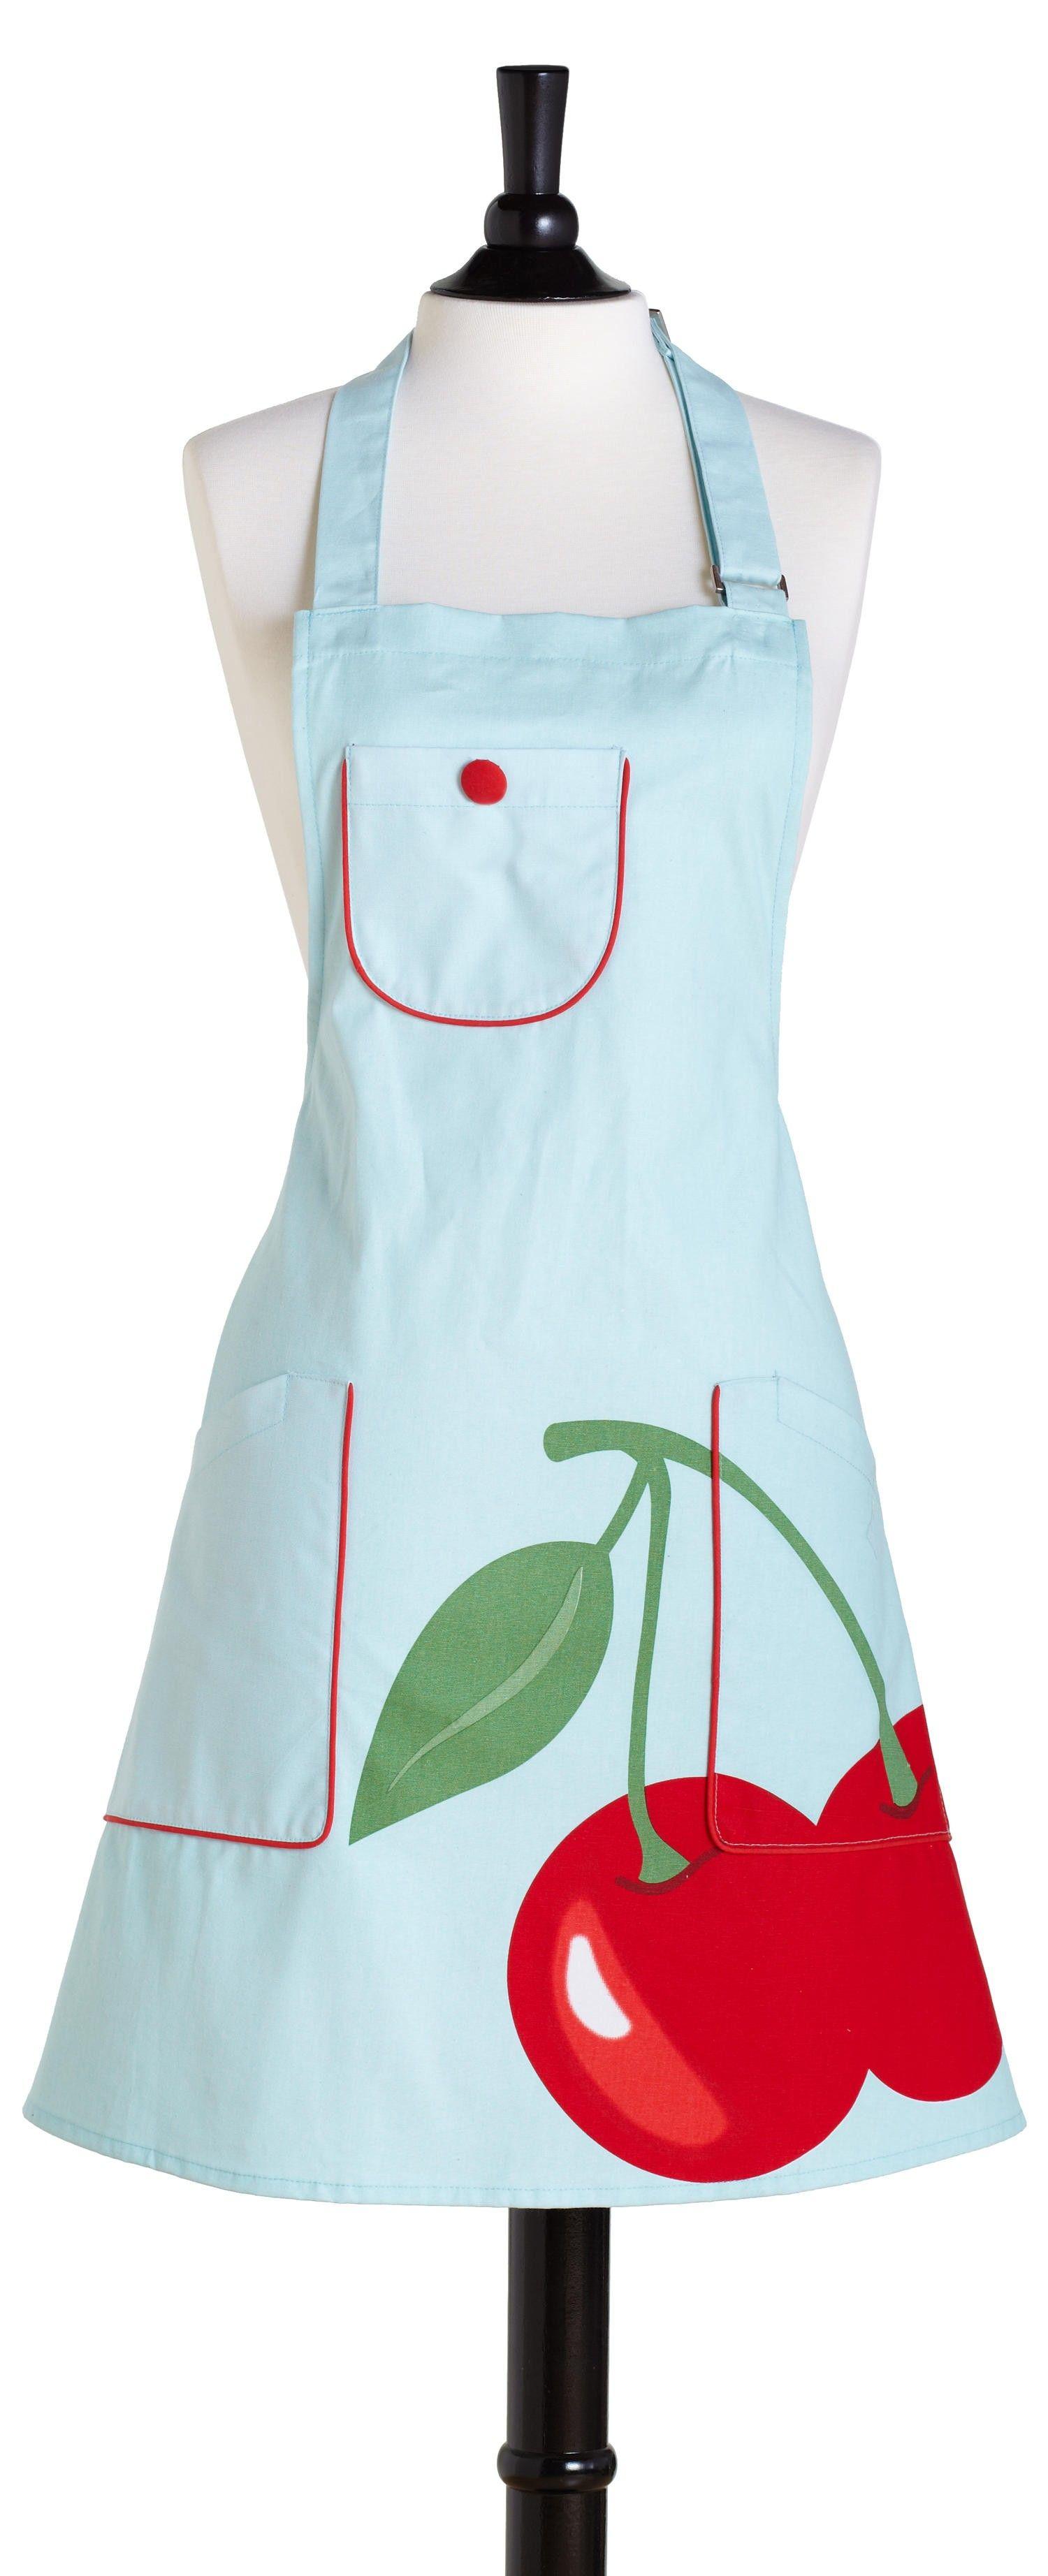 Super Cherry Chef Apron • Jessie Steele | DIY Aprons | Pinterest ...